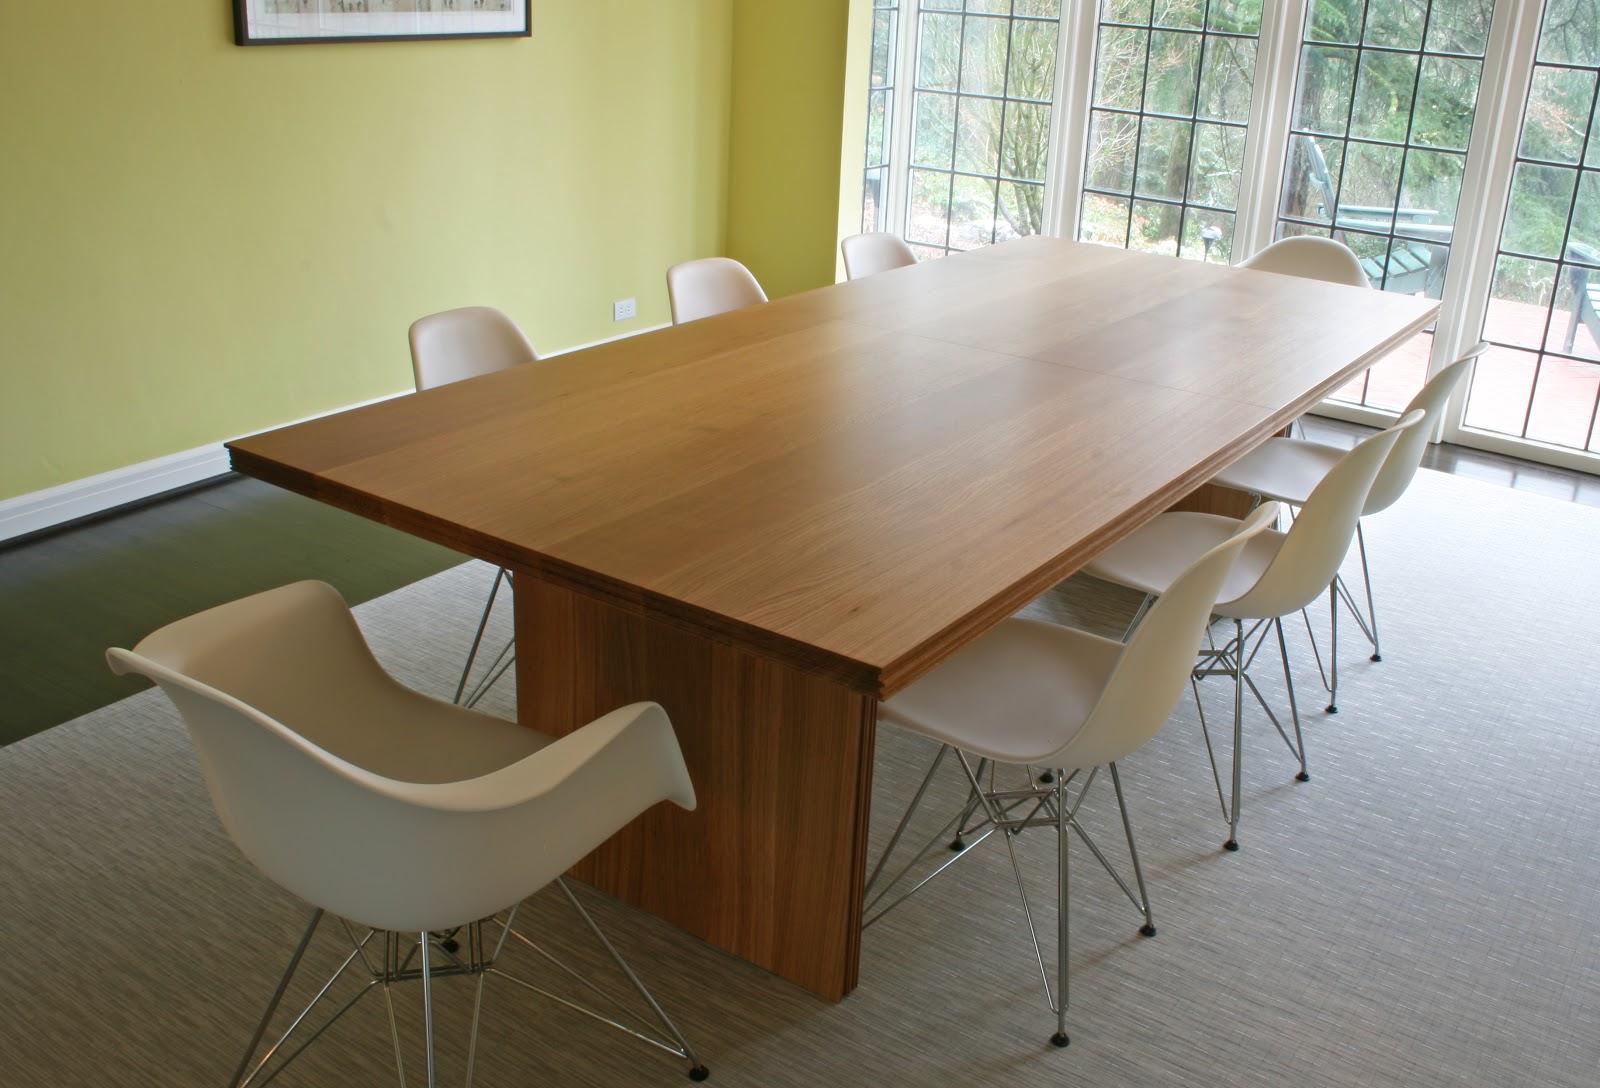 Fresh White Oak Dining Table | Made | Modern Designs for Modern Ideals WP42